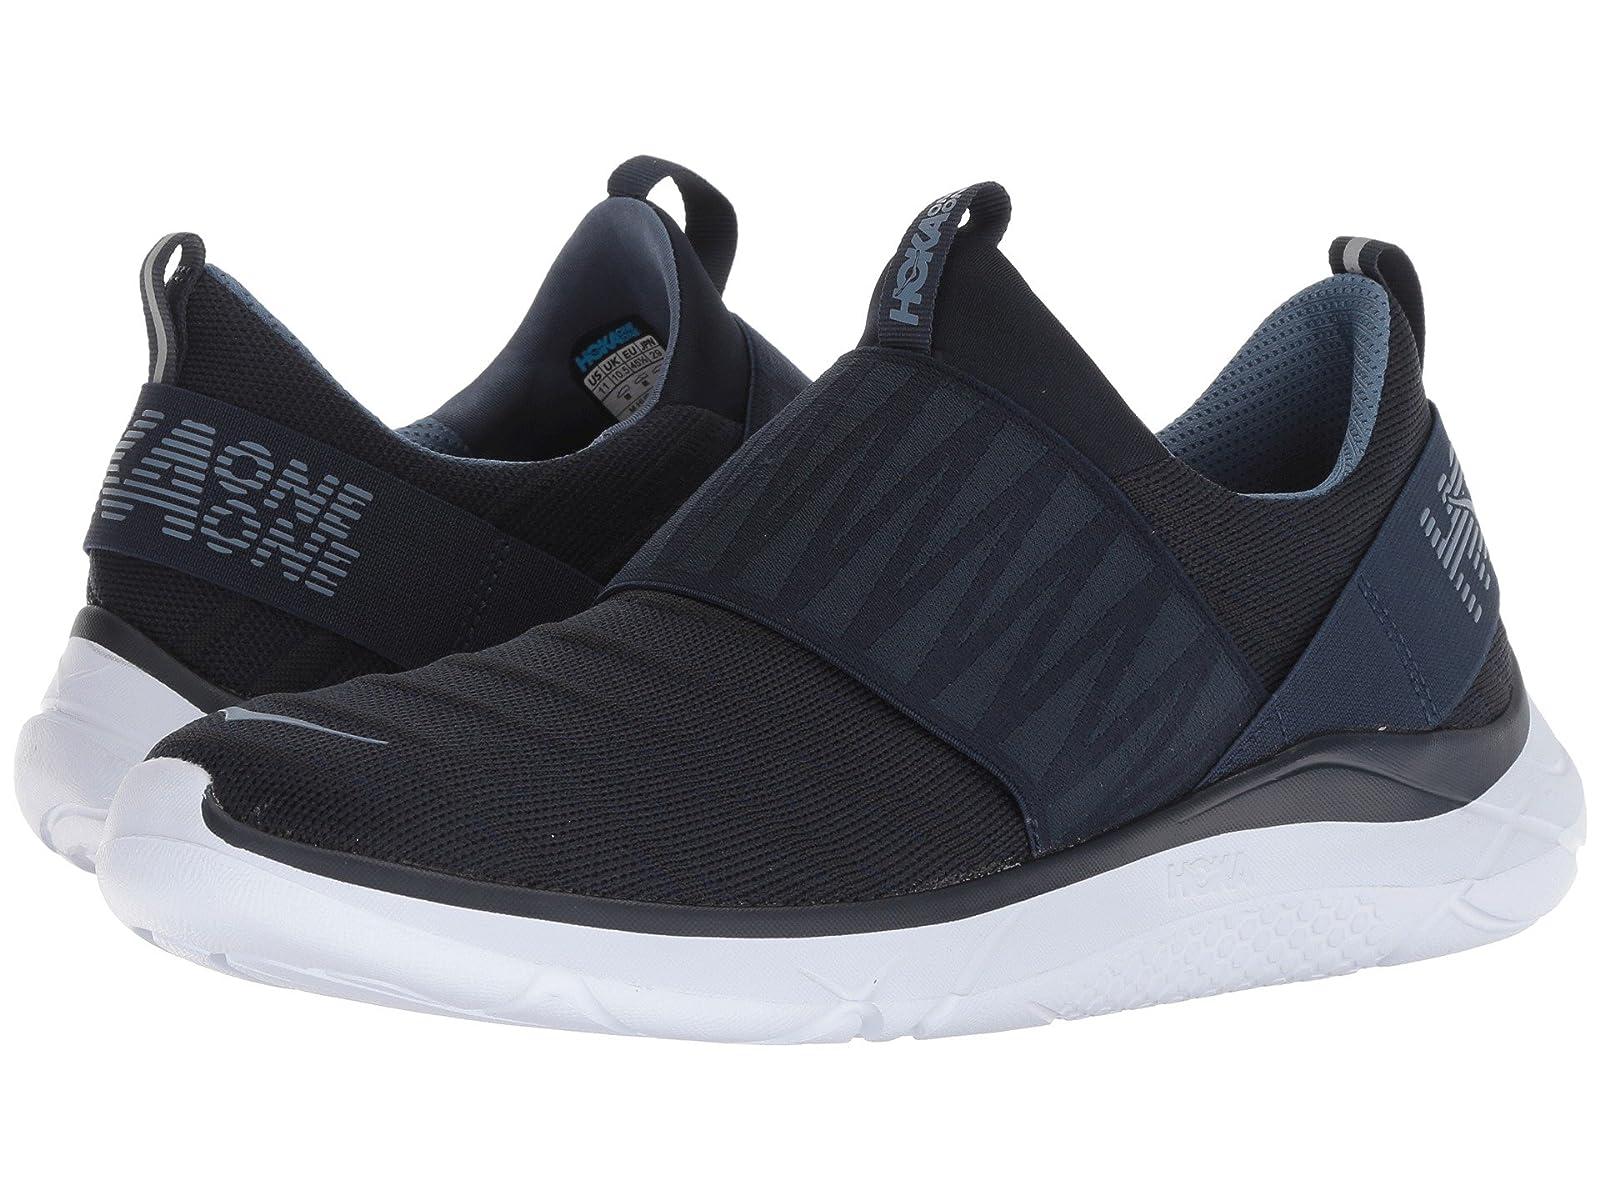 Hoka One One Hupana SlipAtmospheric grades have affordable shoes